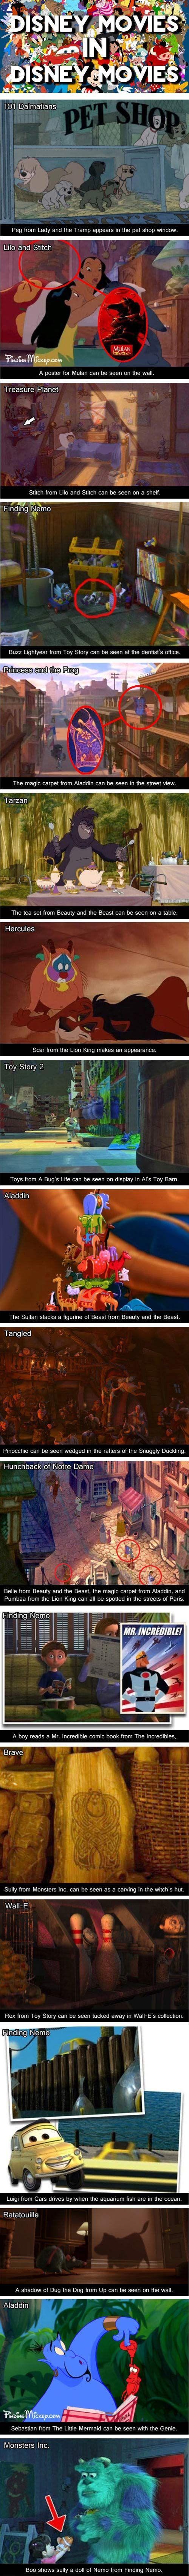 Disney Movies Inside Other Disney Movies…